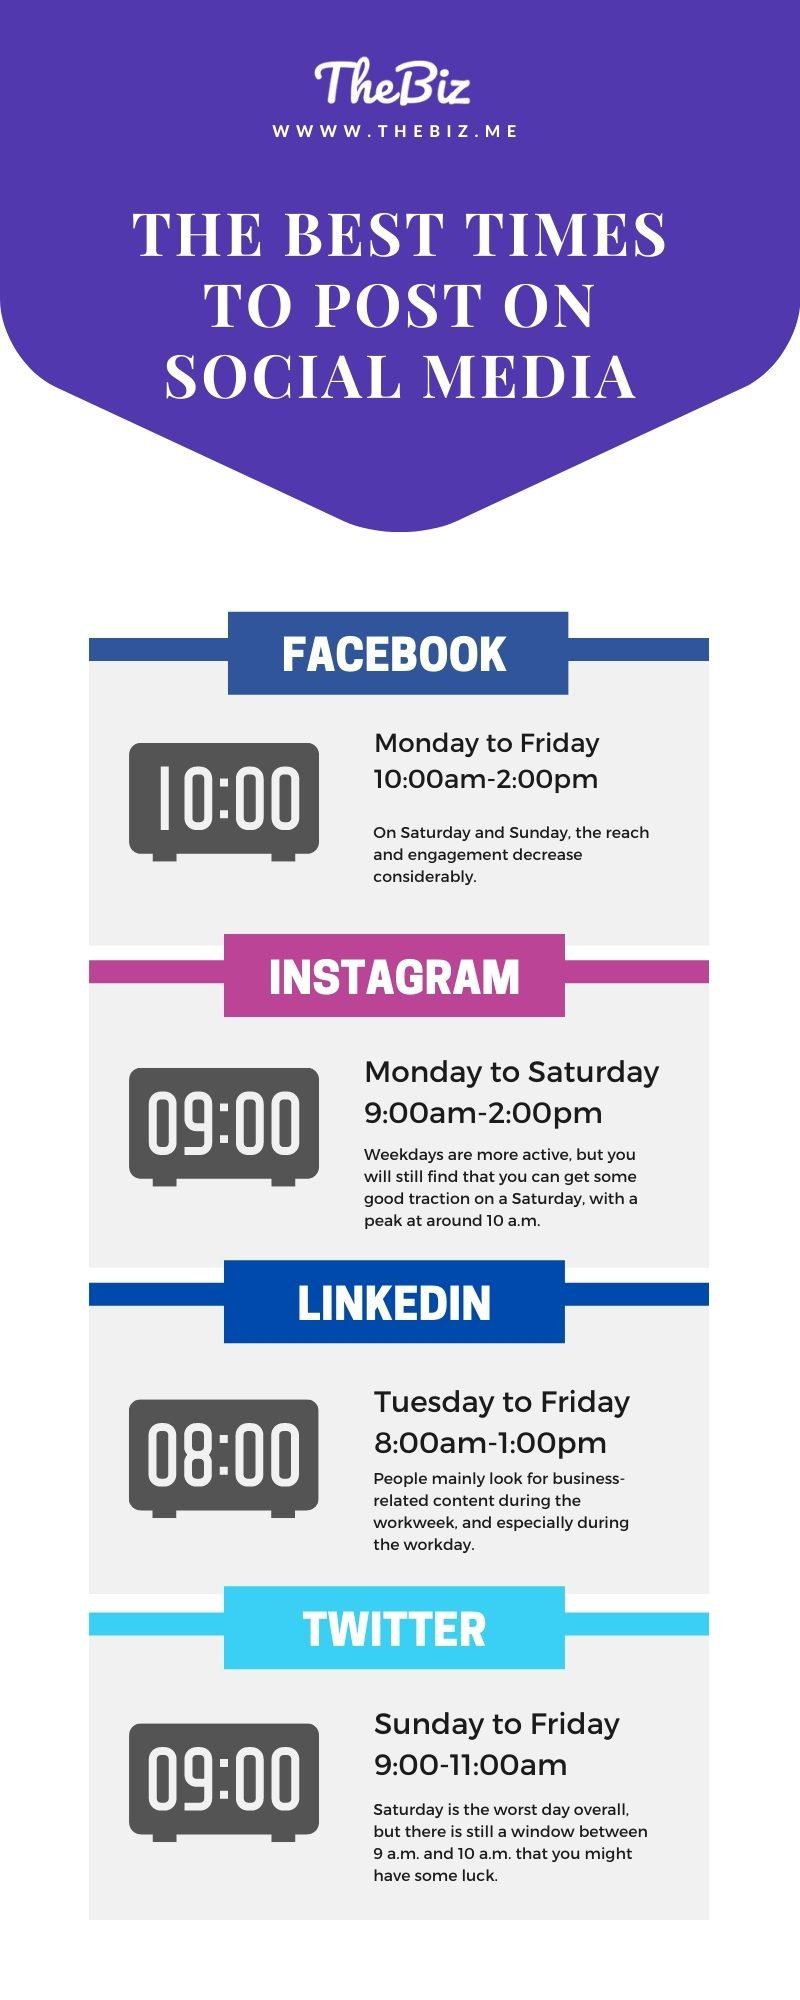 the best times to post on social media instagram facebook linkedin twitter